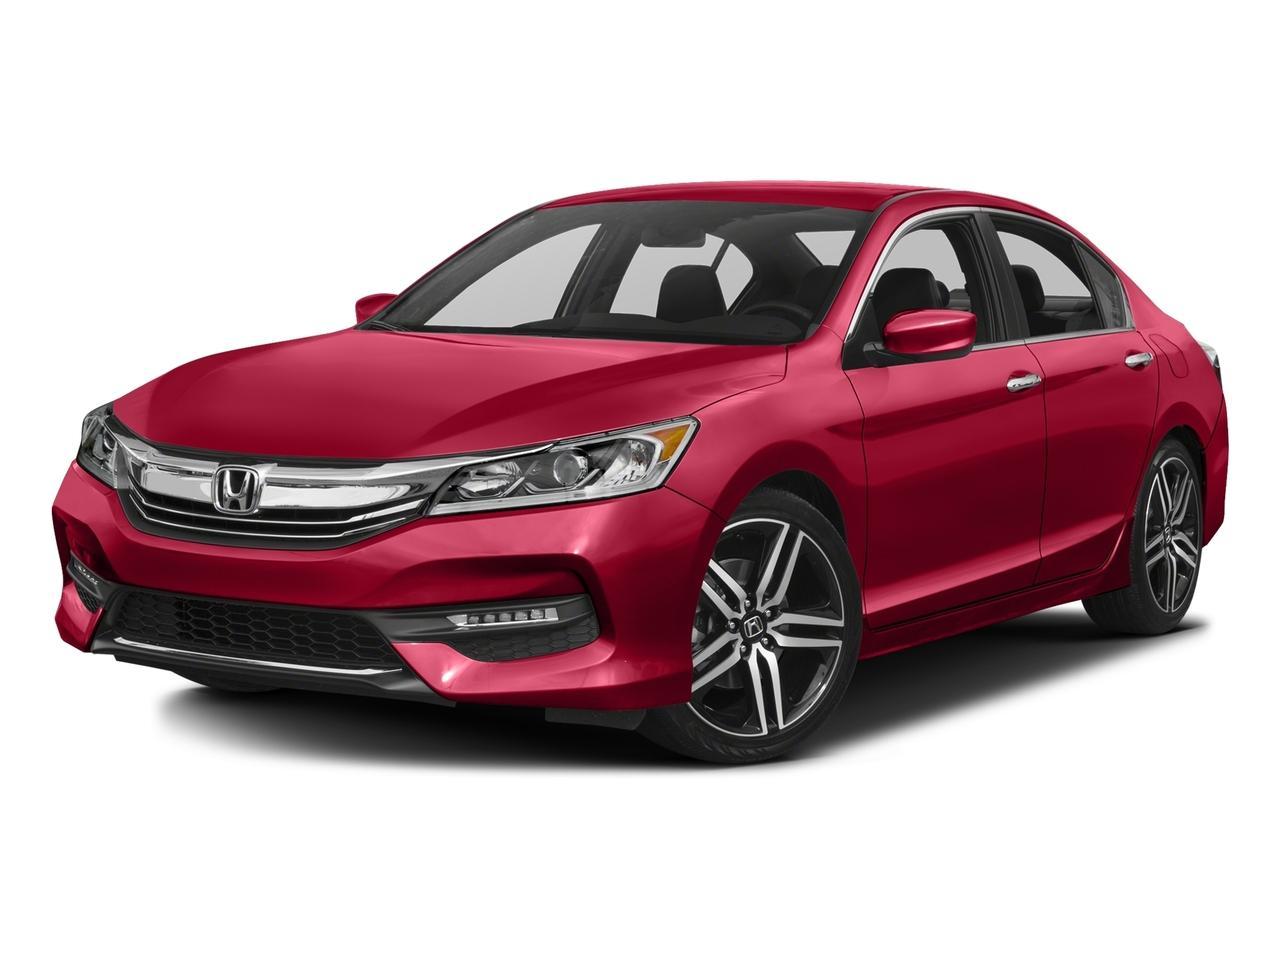 2016 Honda Accord Sedan Vehicle Photo in PORTLAND, OR 97225-3518